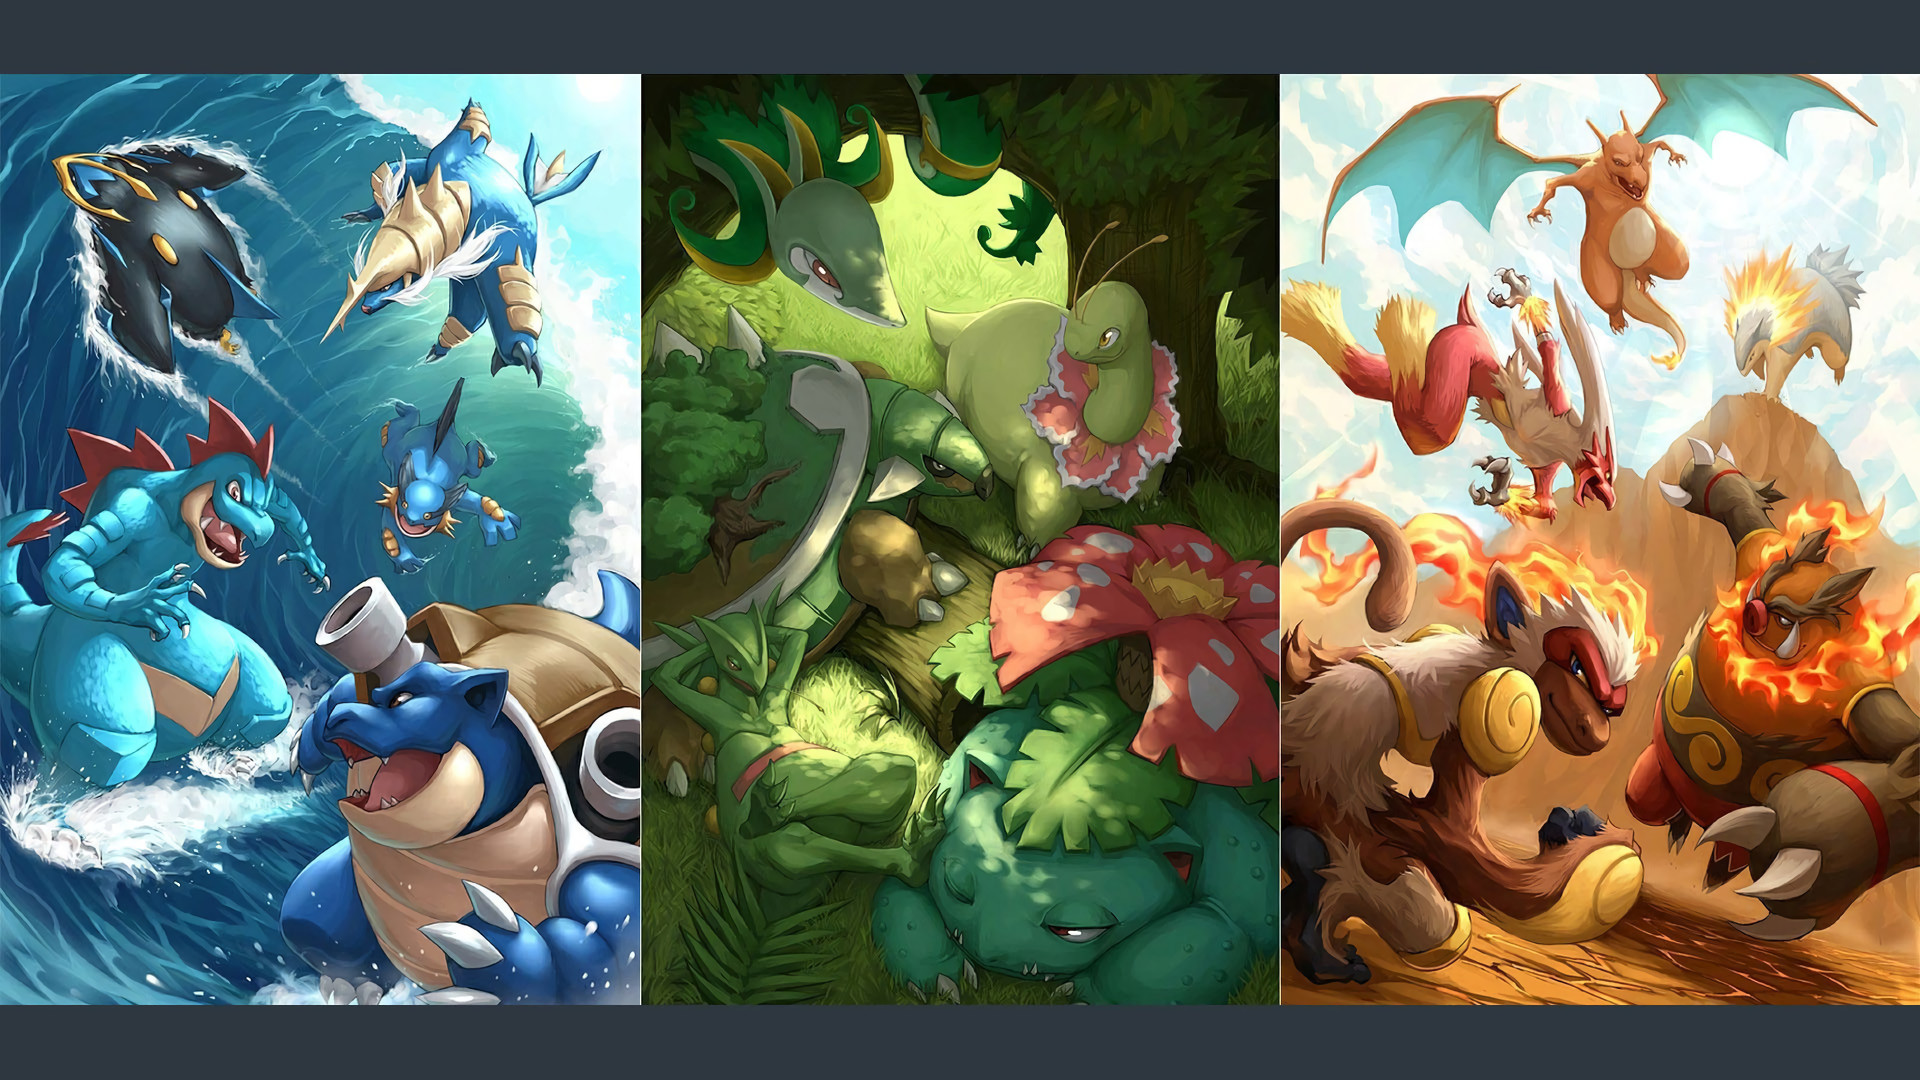 6 Empoleon (Pokémon) HD Wallpapers | Backgrounds – Wallpaper Abyss